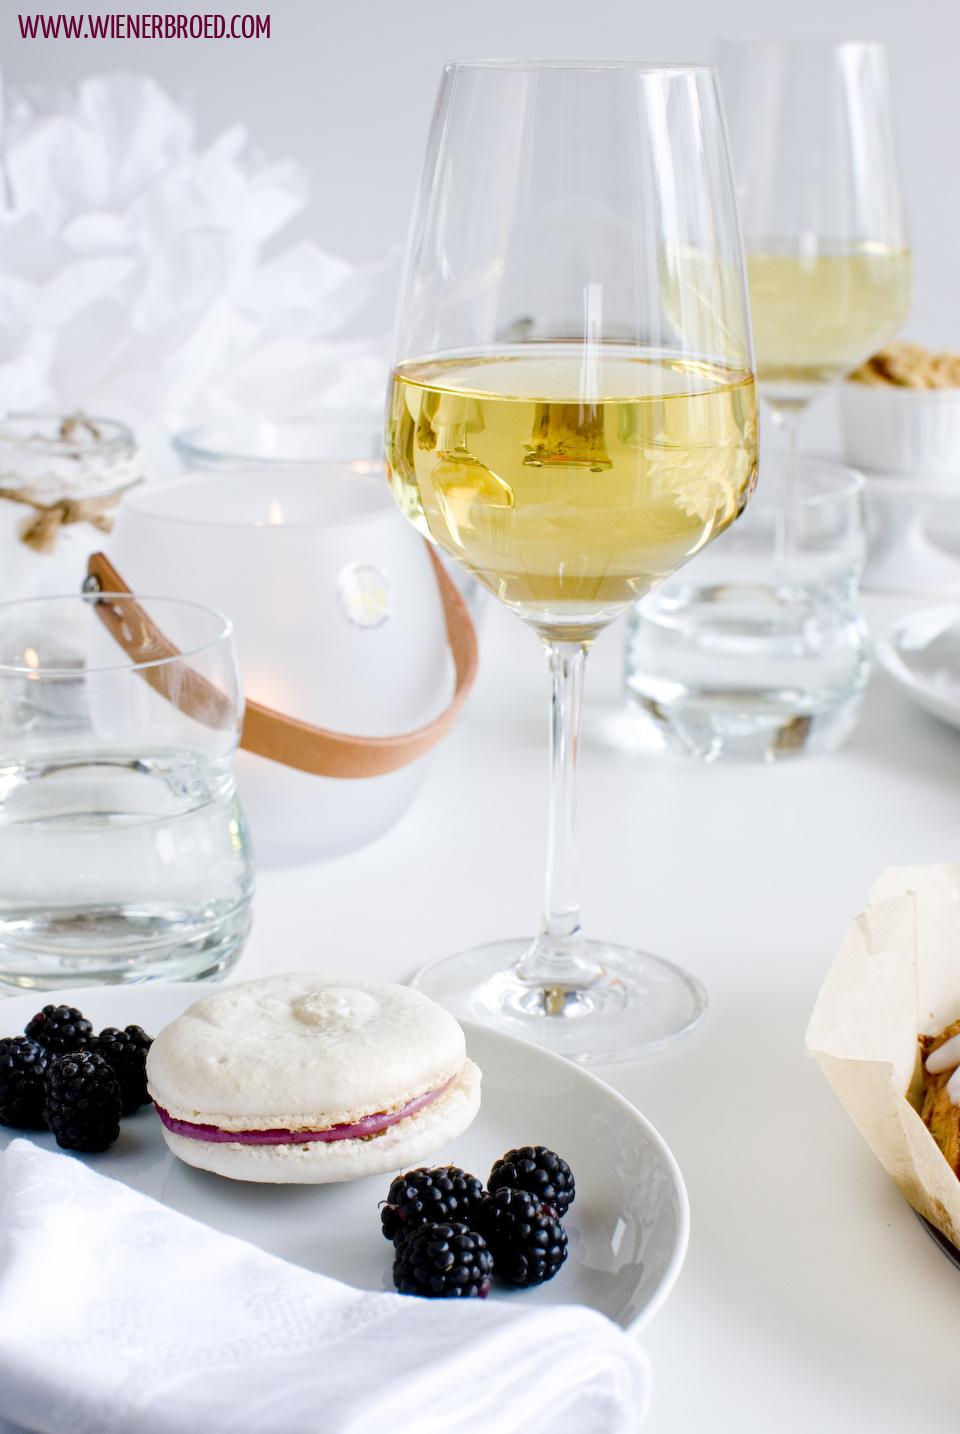 Vanille-Macarons mit Brombeer-Ganache / Vanilla macaron with blackberry ganache [wienerbroed.com]